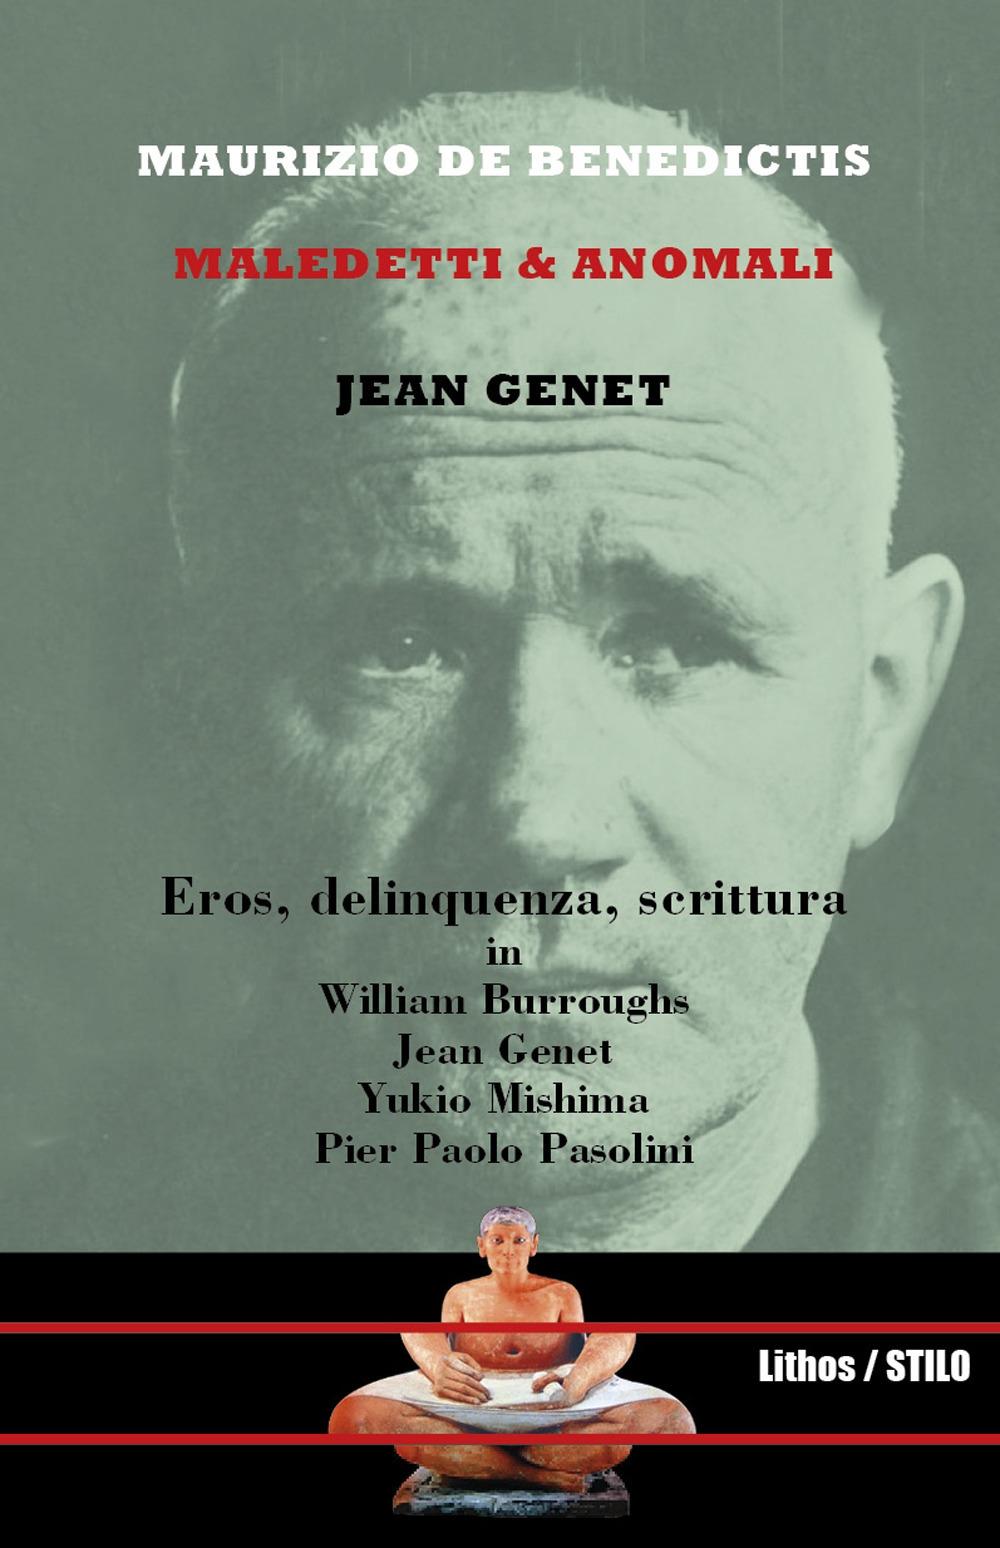 Maledetti & anomali. Jean Genet